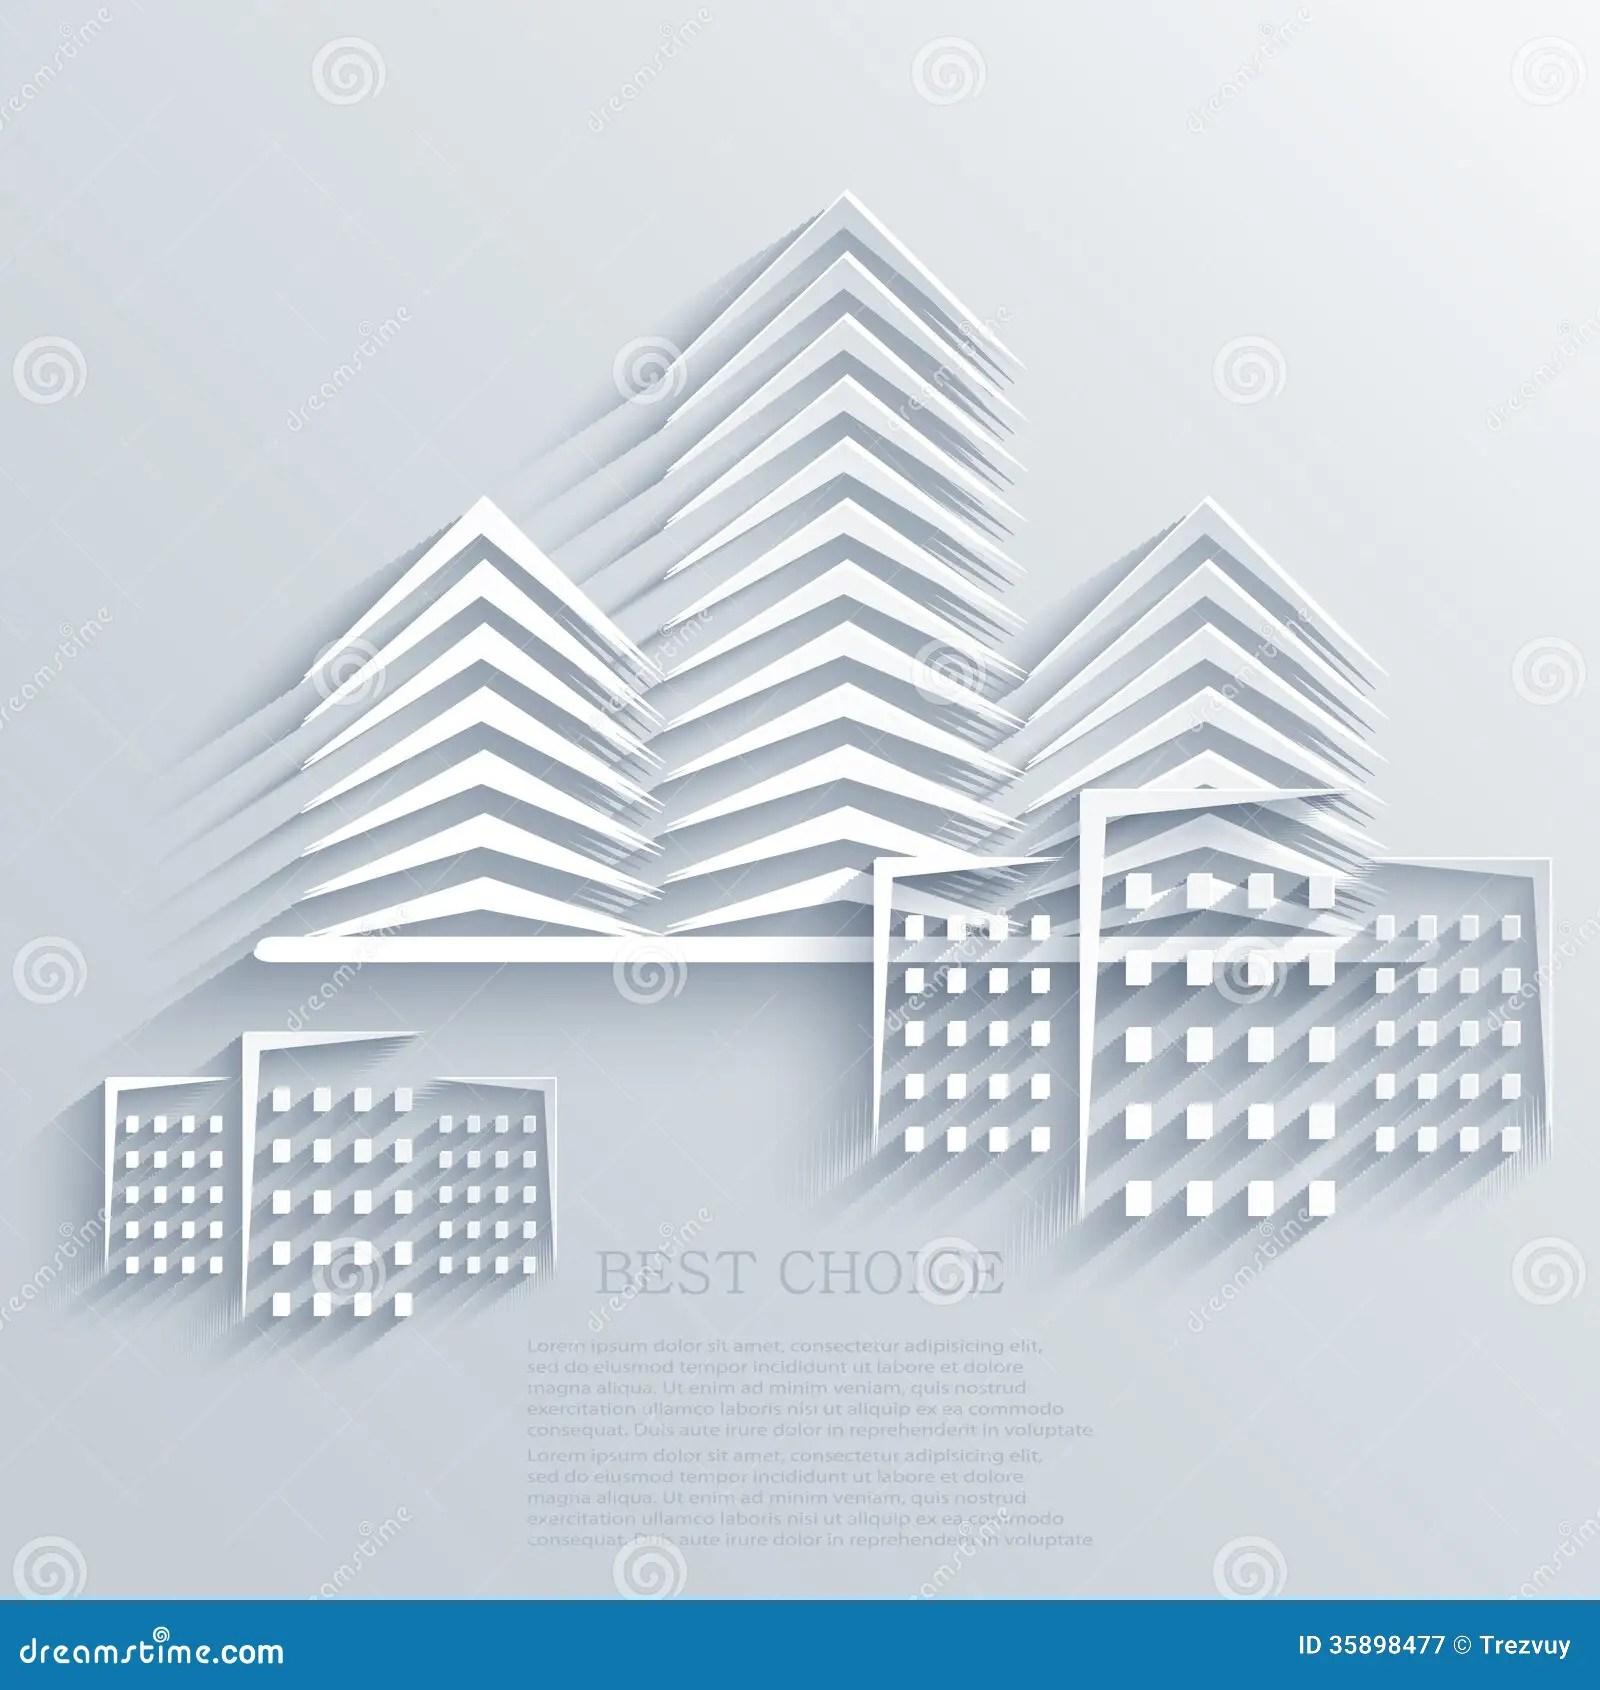 vector real estate icon